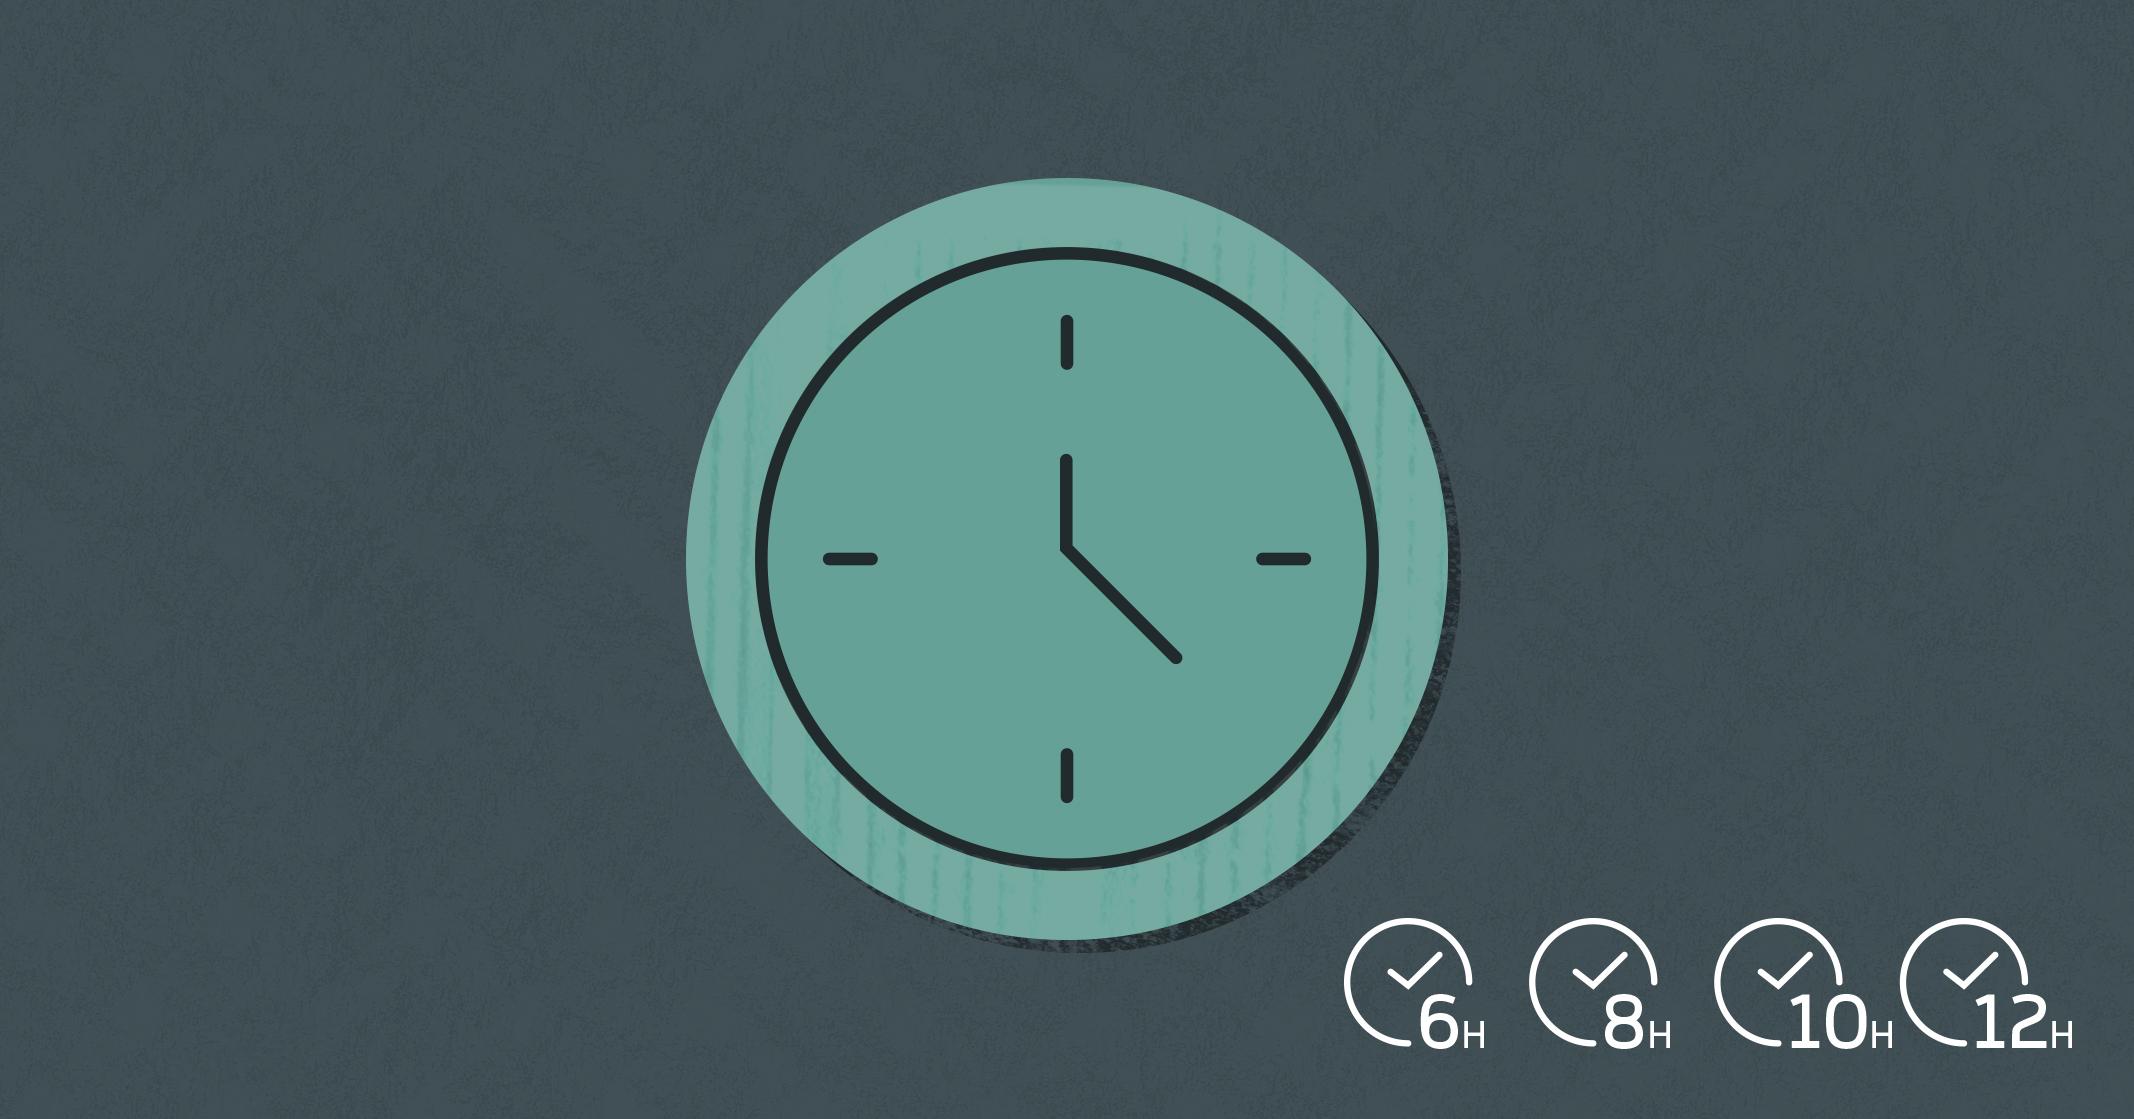 cp012_tempo_12.jpg.jpg